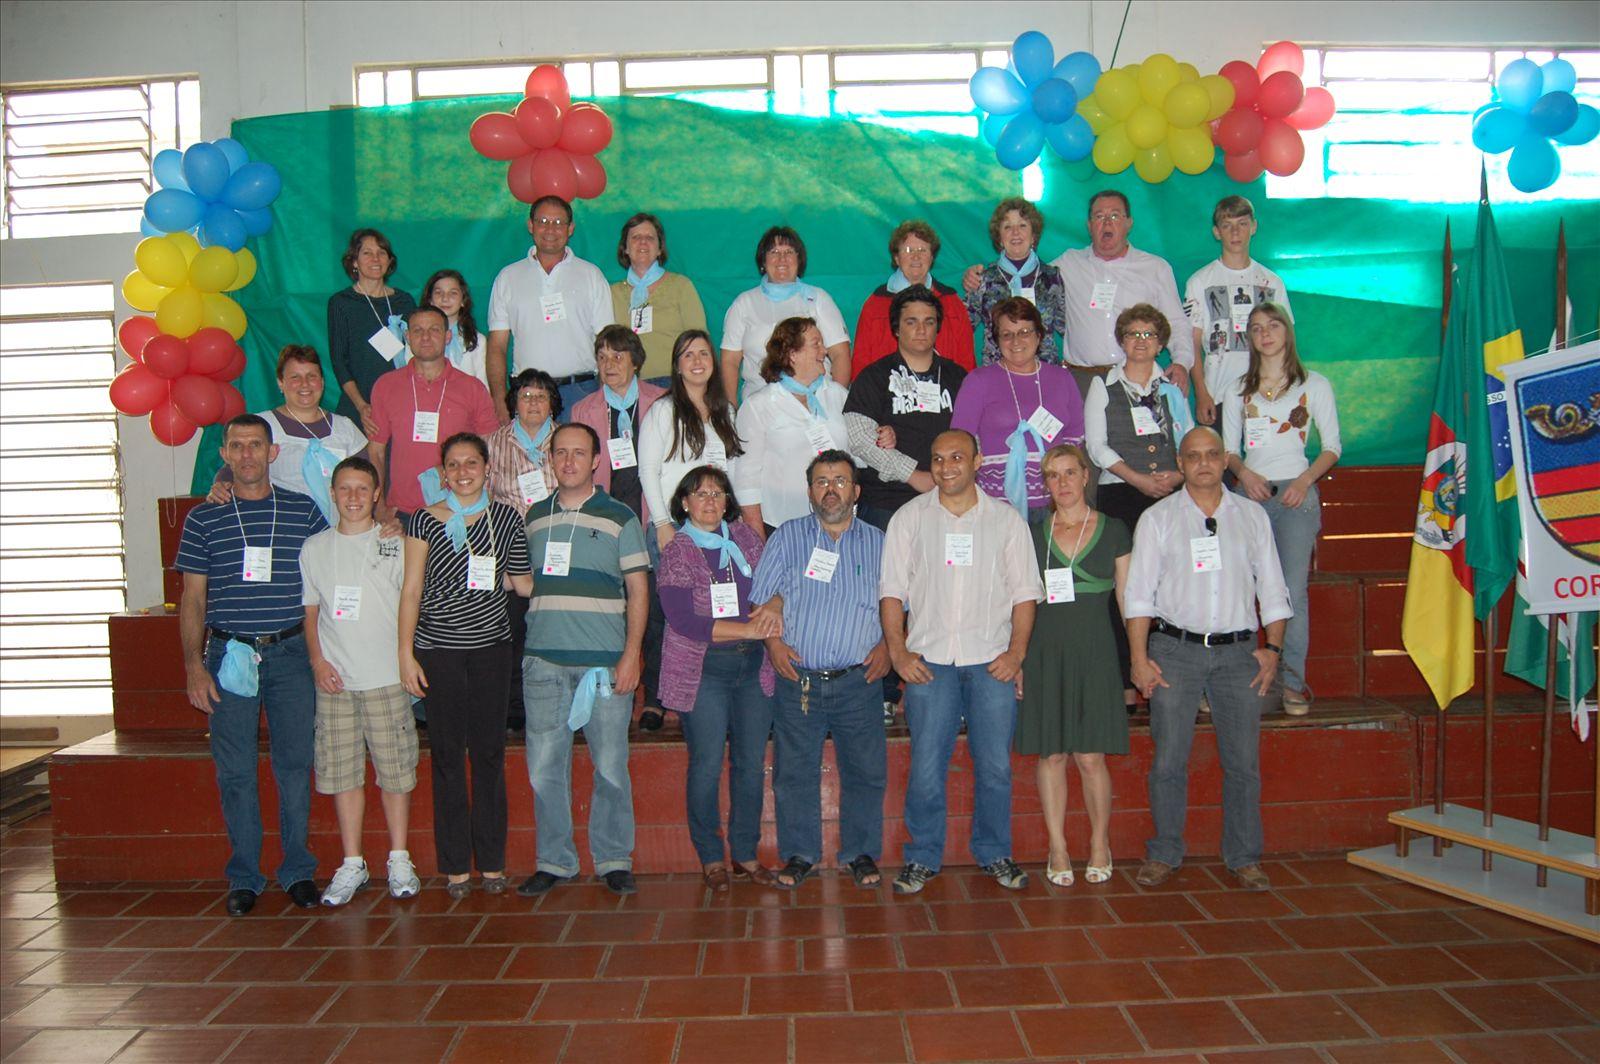 2º Encontro Família Cornelli - 11.10.2009 (190)_0